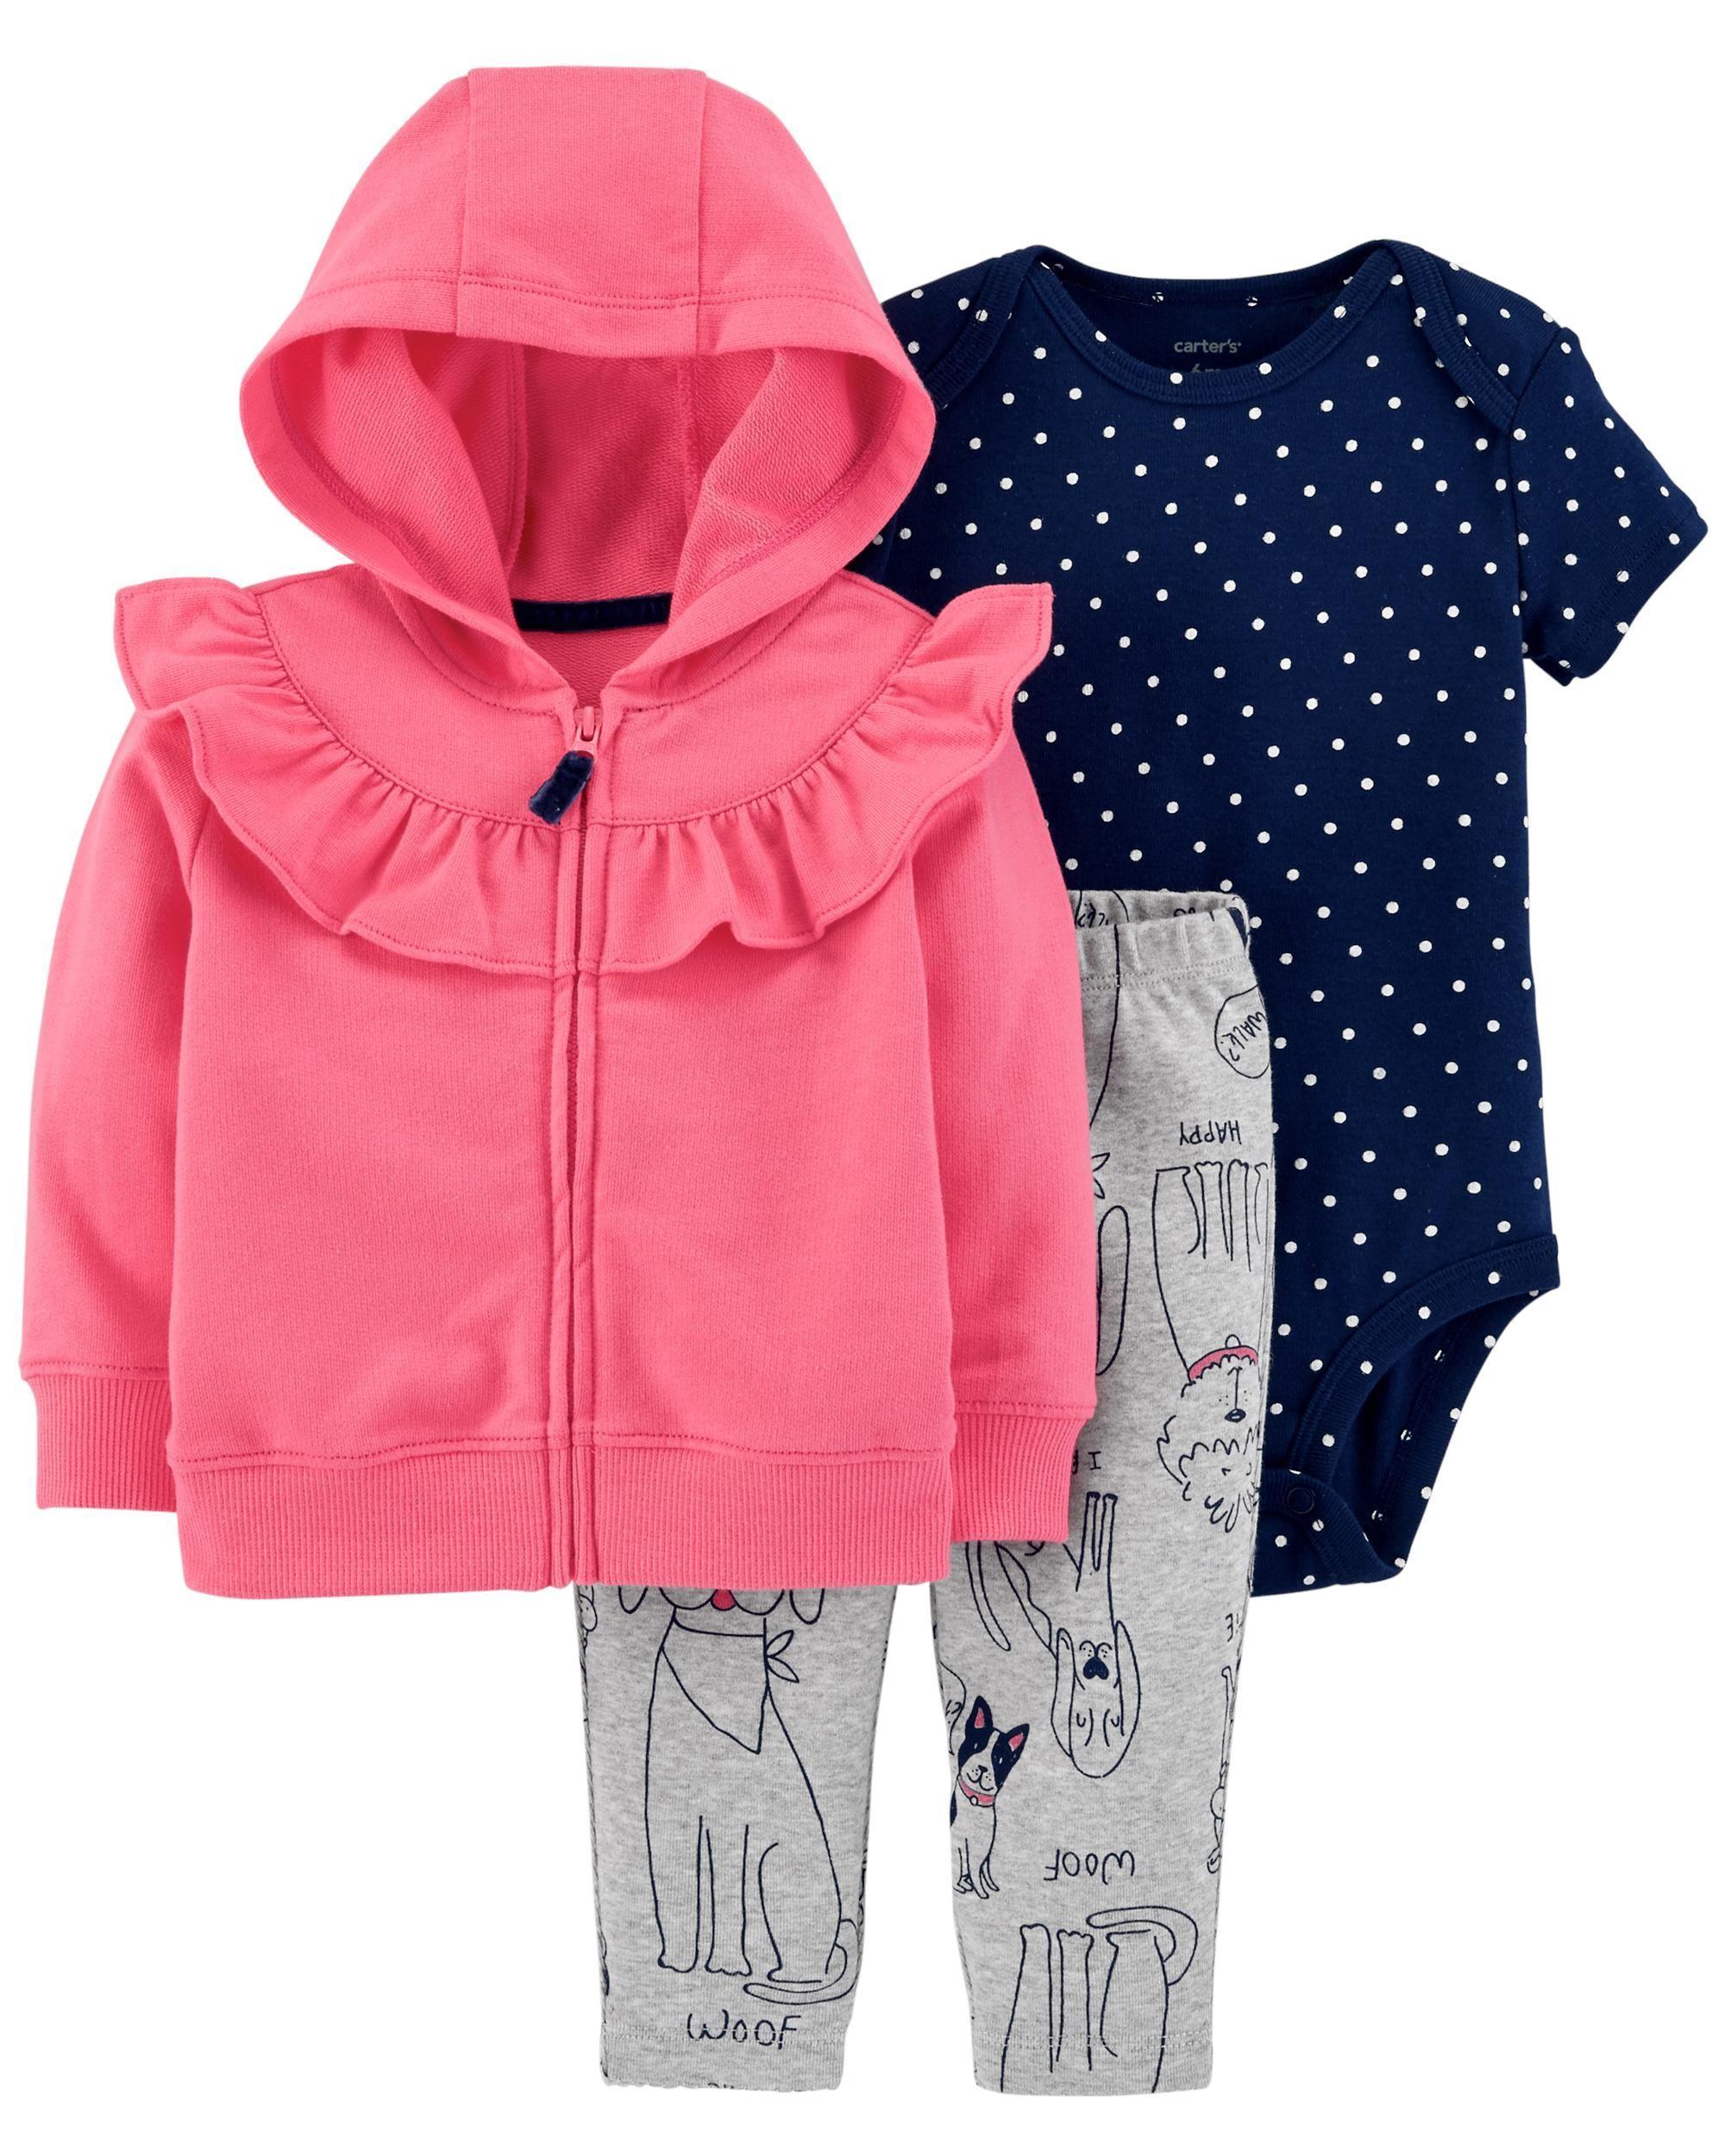 Piece Little Jacket Set BabyGirl Pinterest Baby Carters